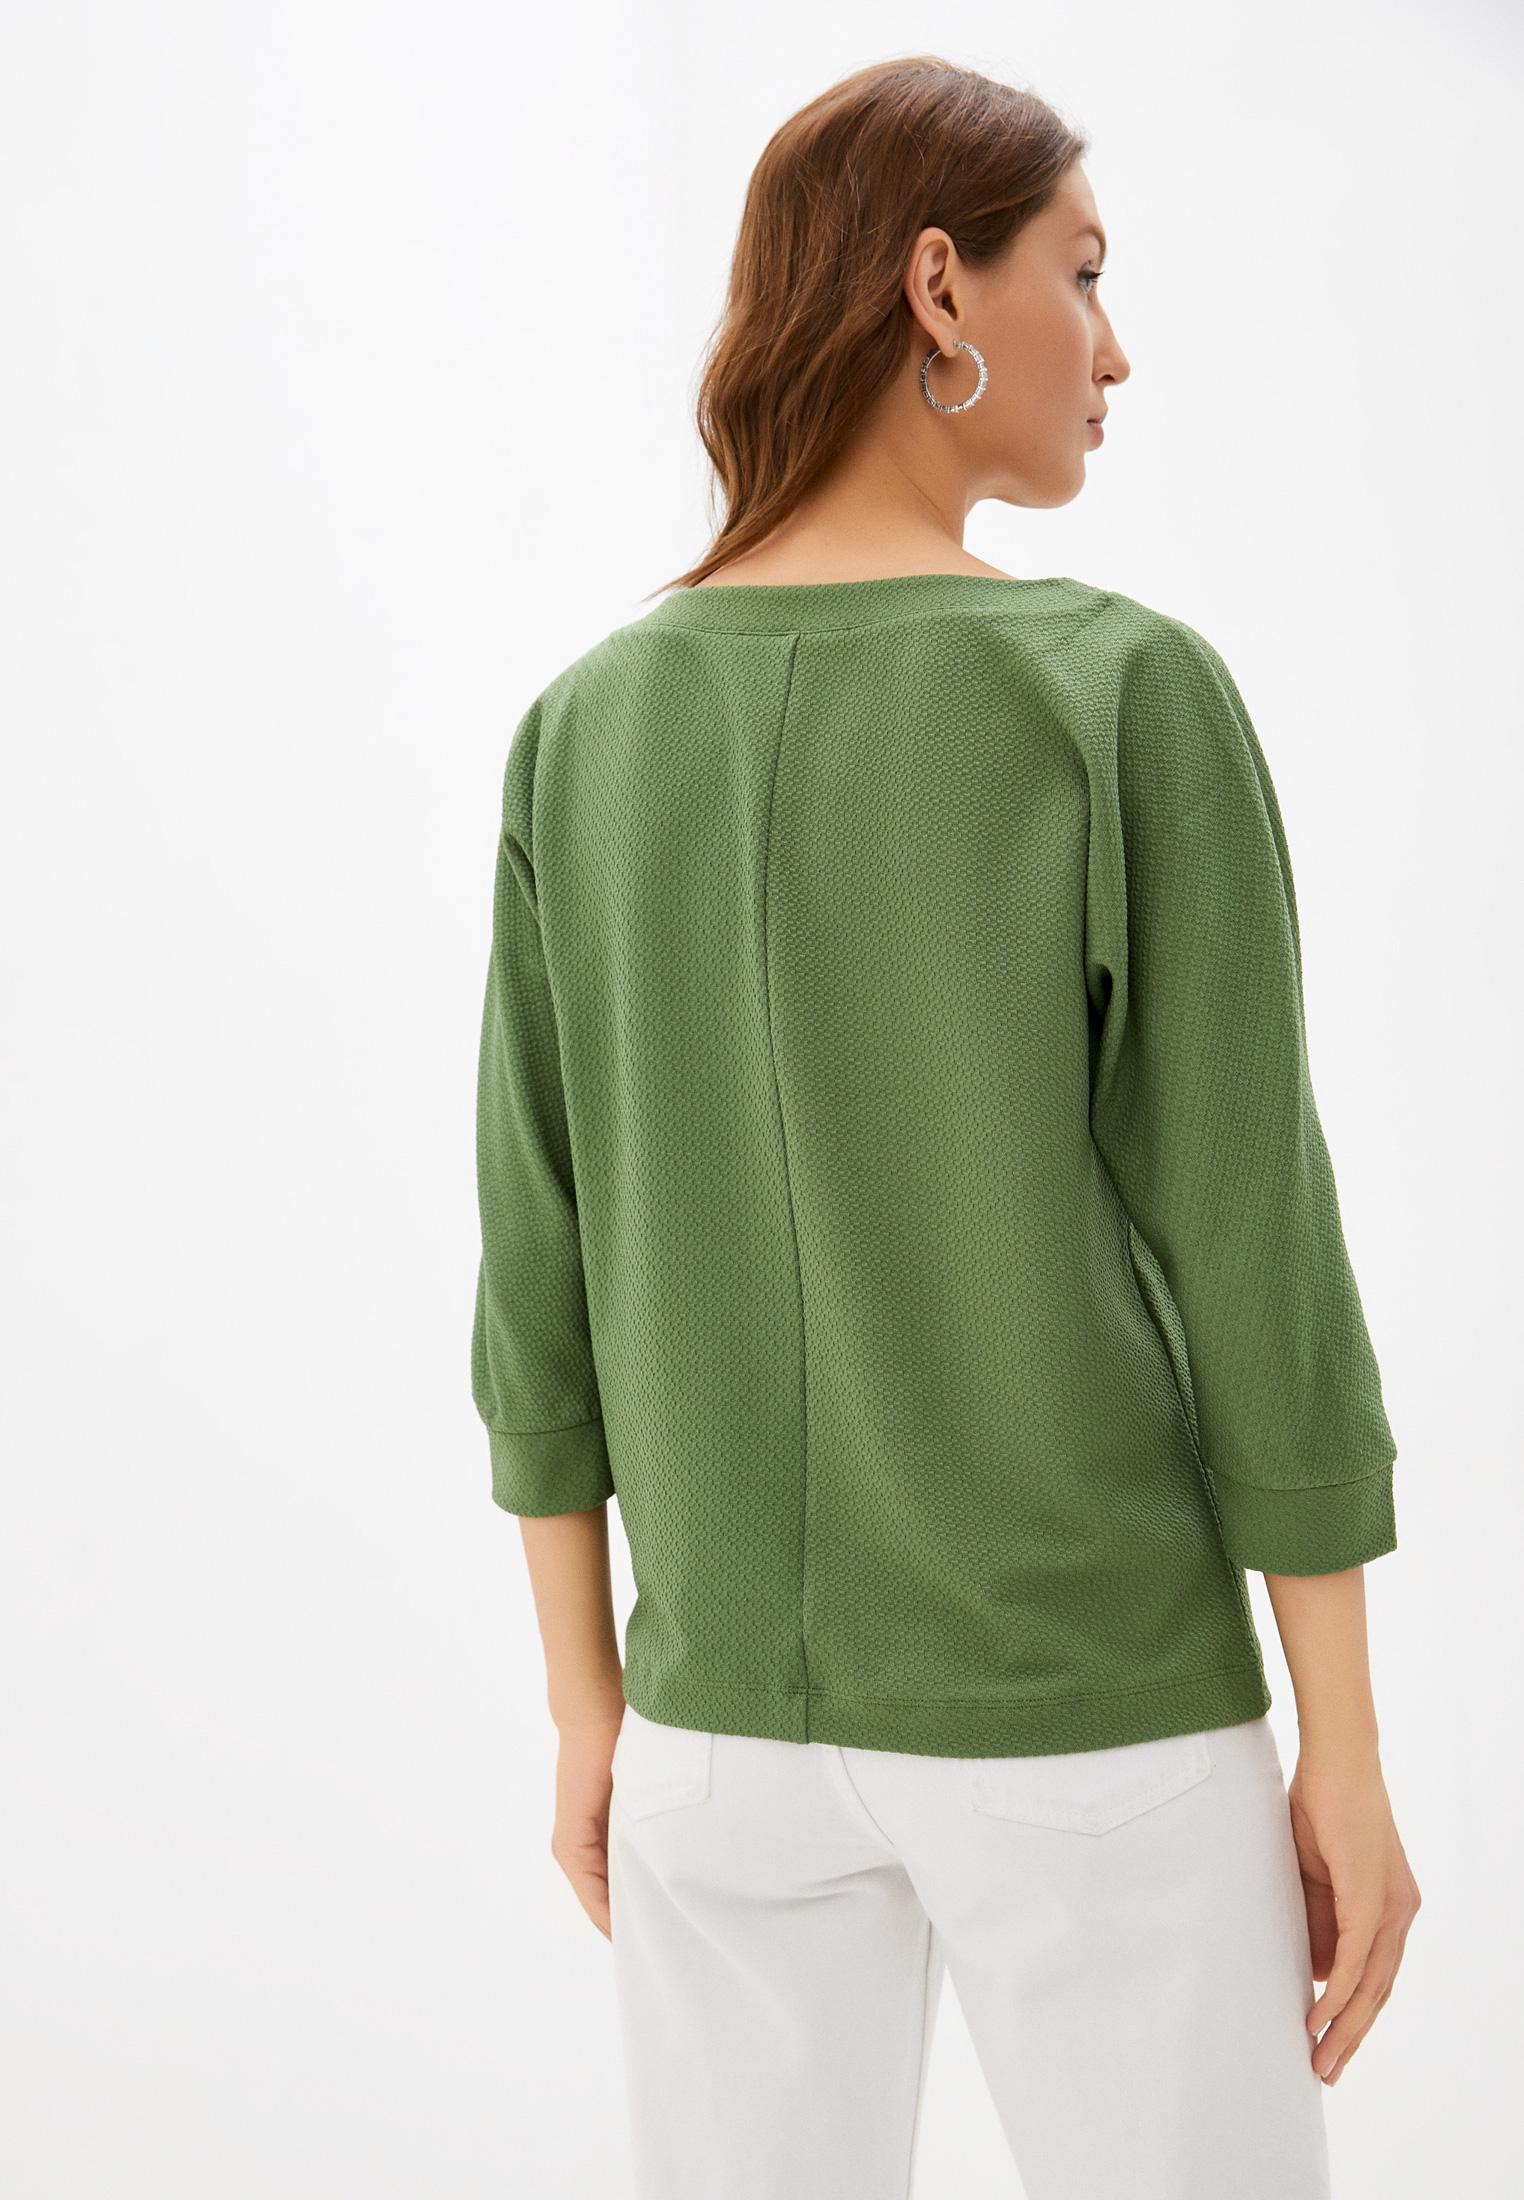 Блуза Betty & Co 2465/3236: изображение 3